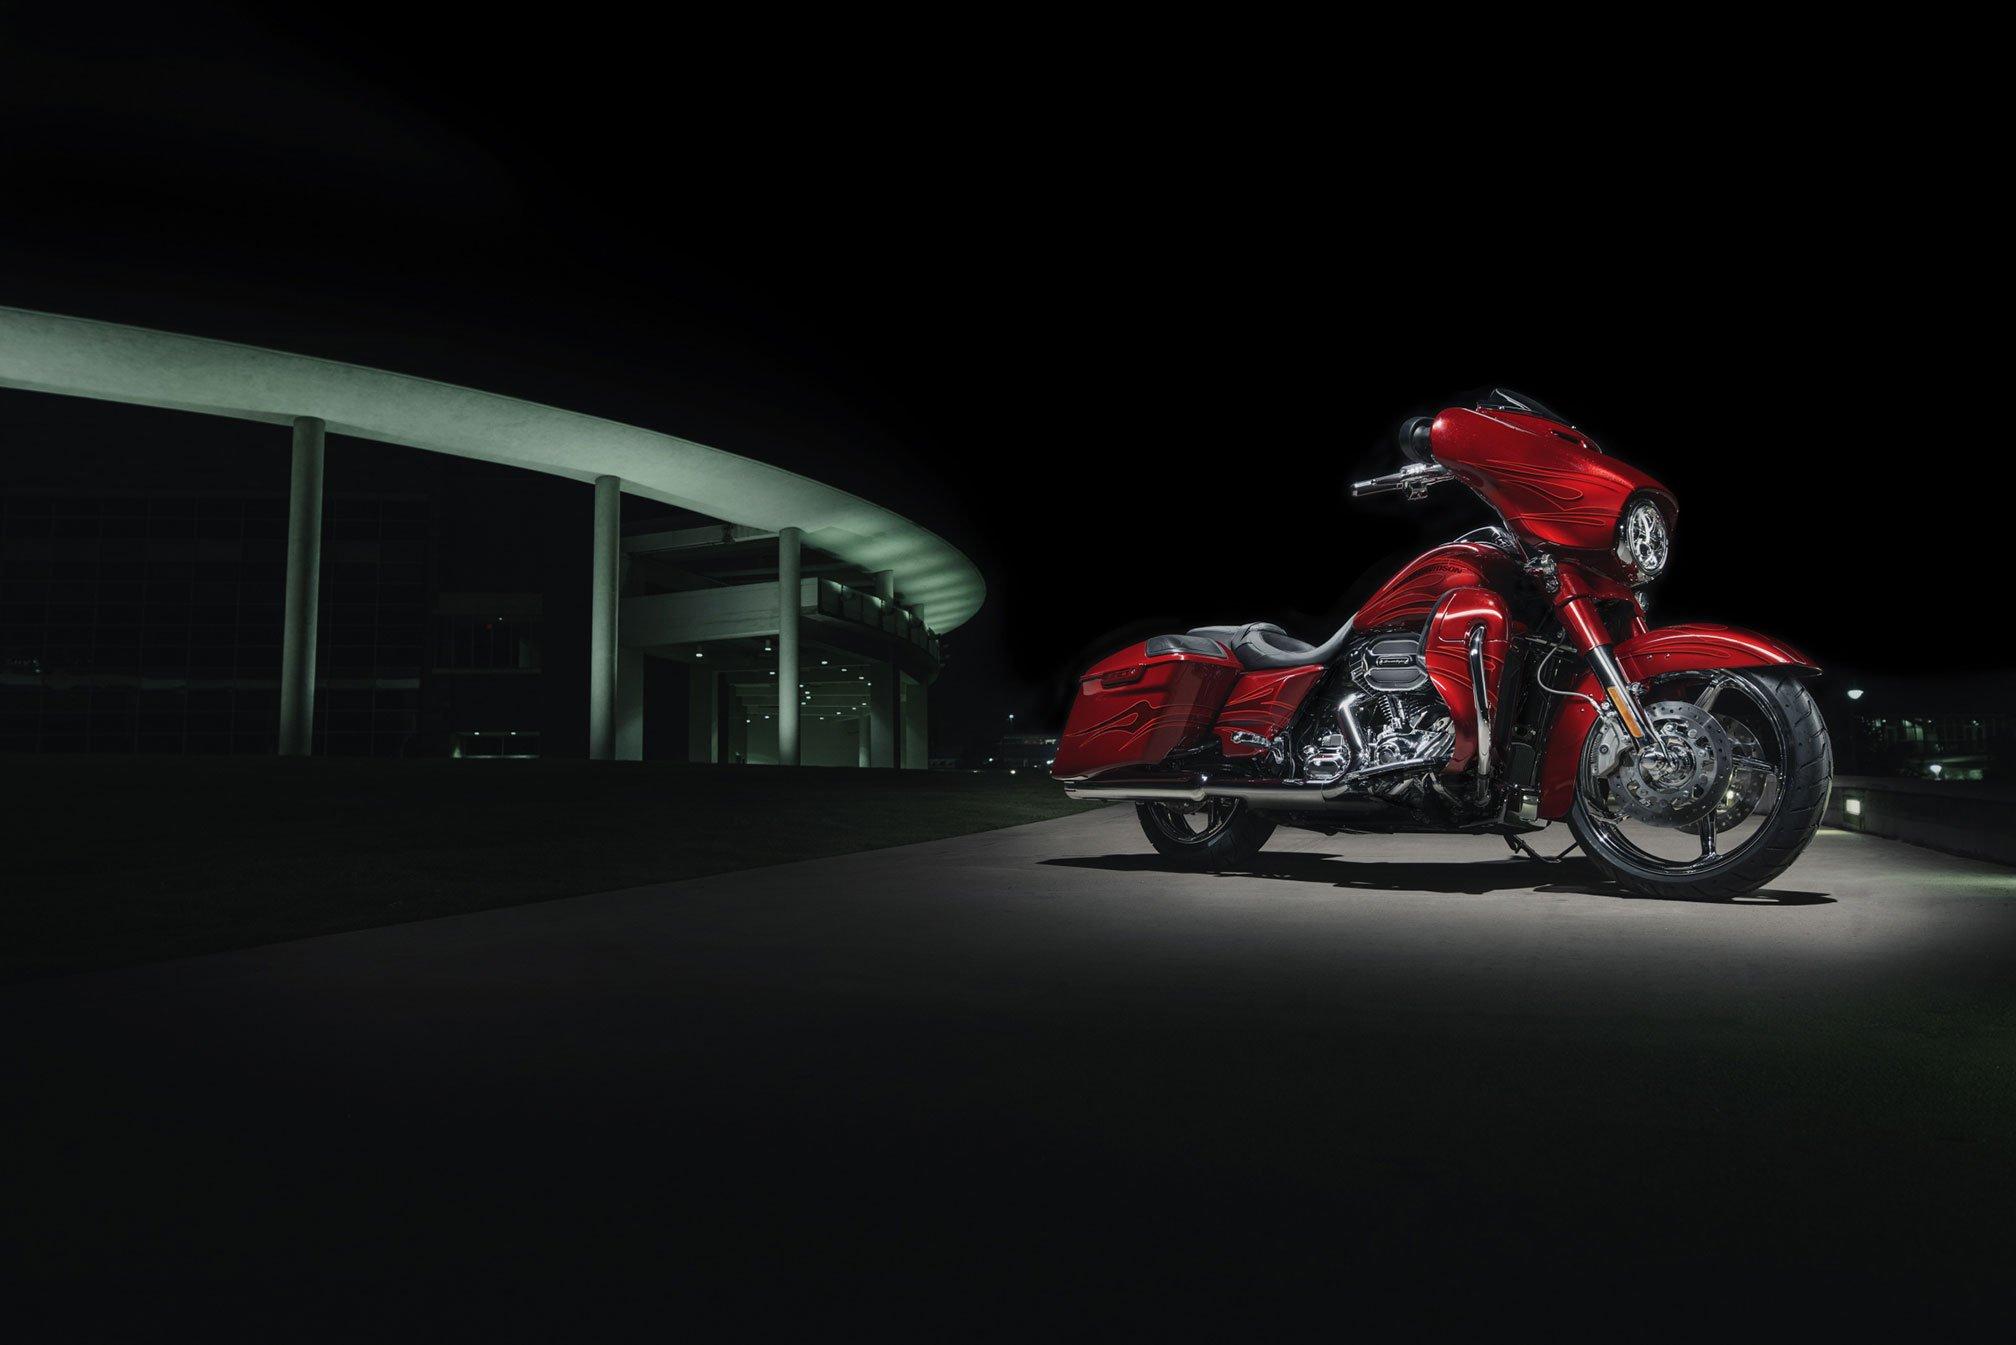 2016 Harley Davidson HD Wallpapers